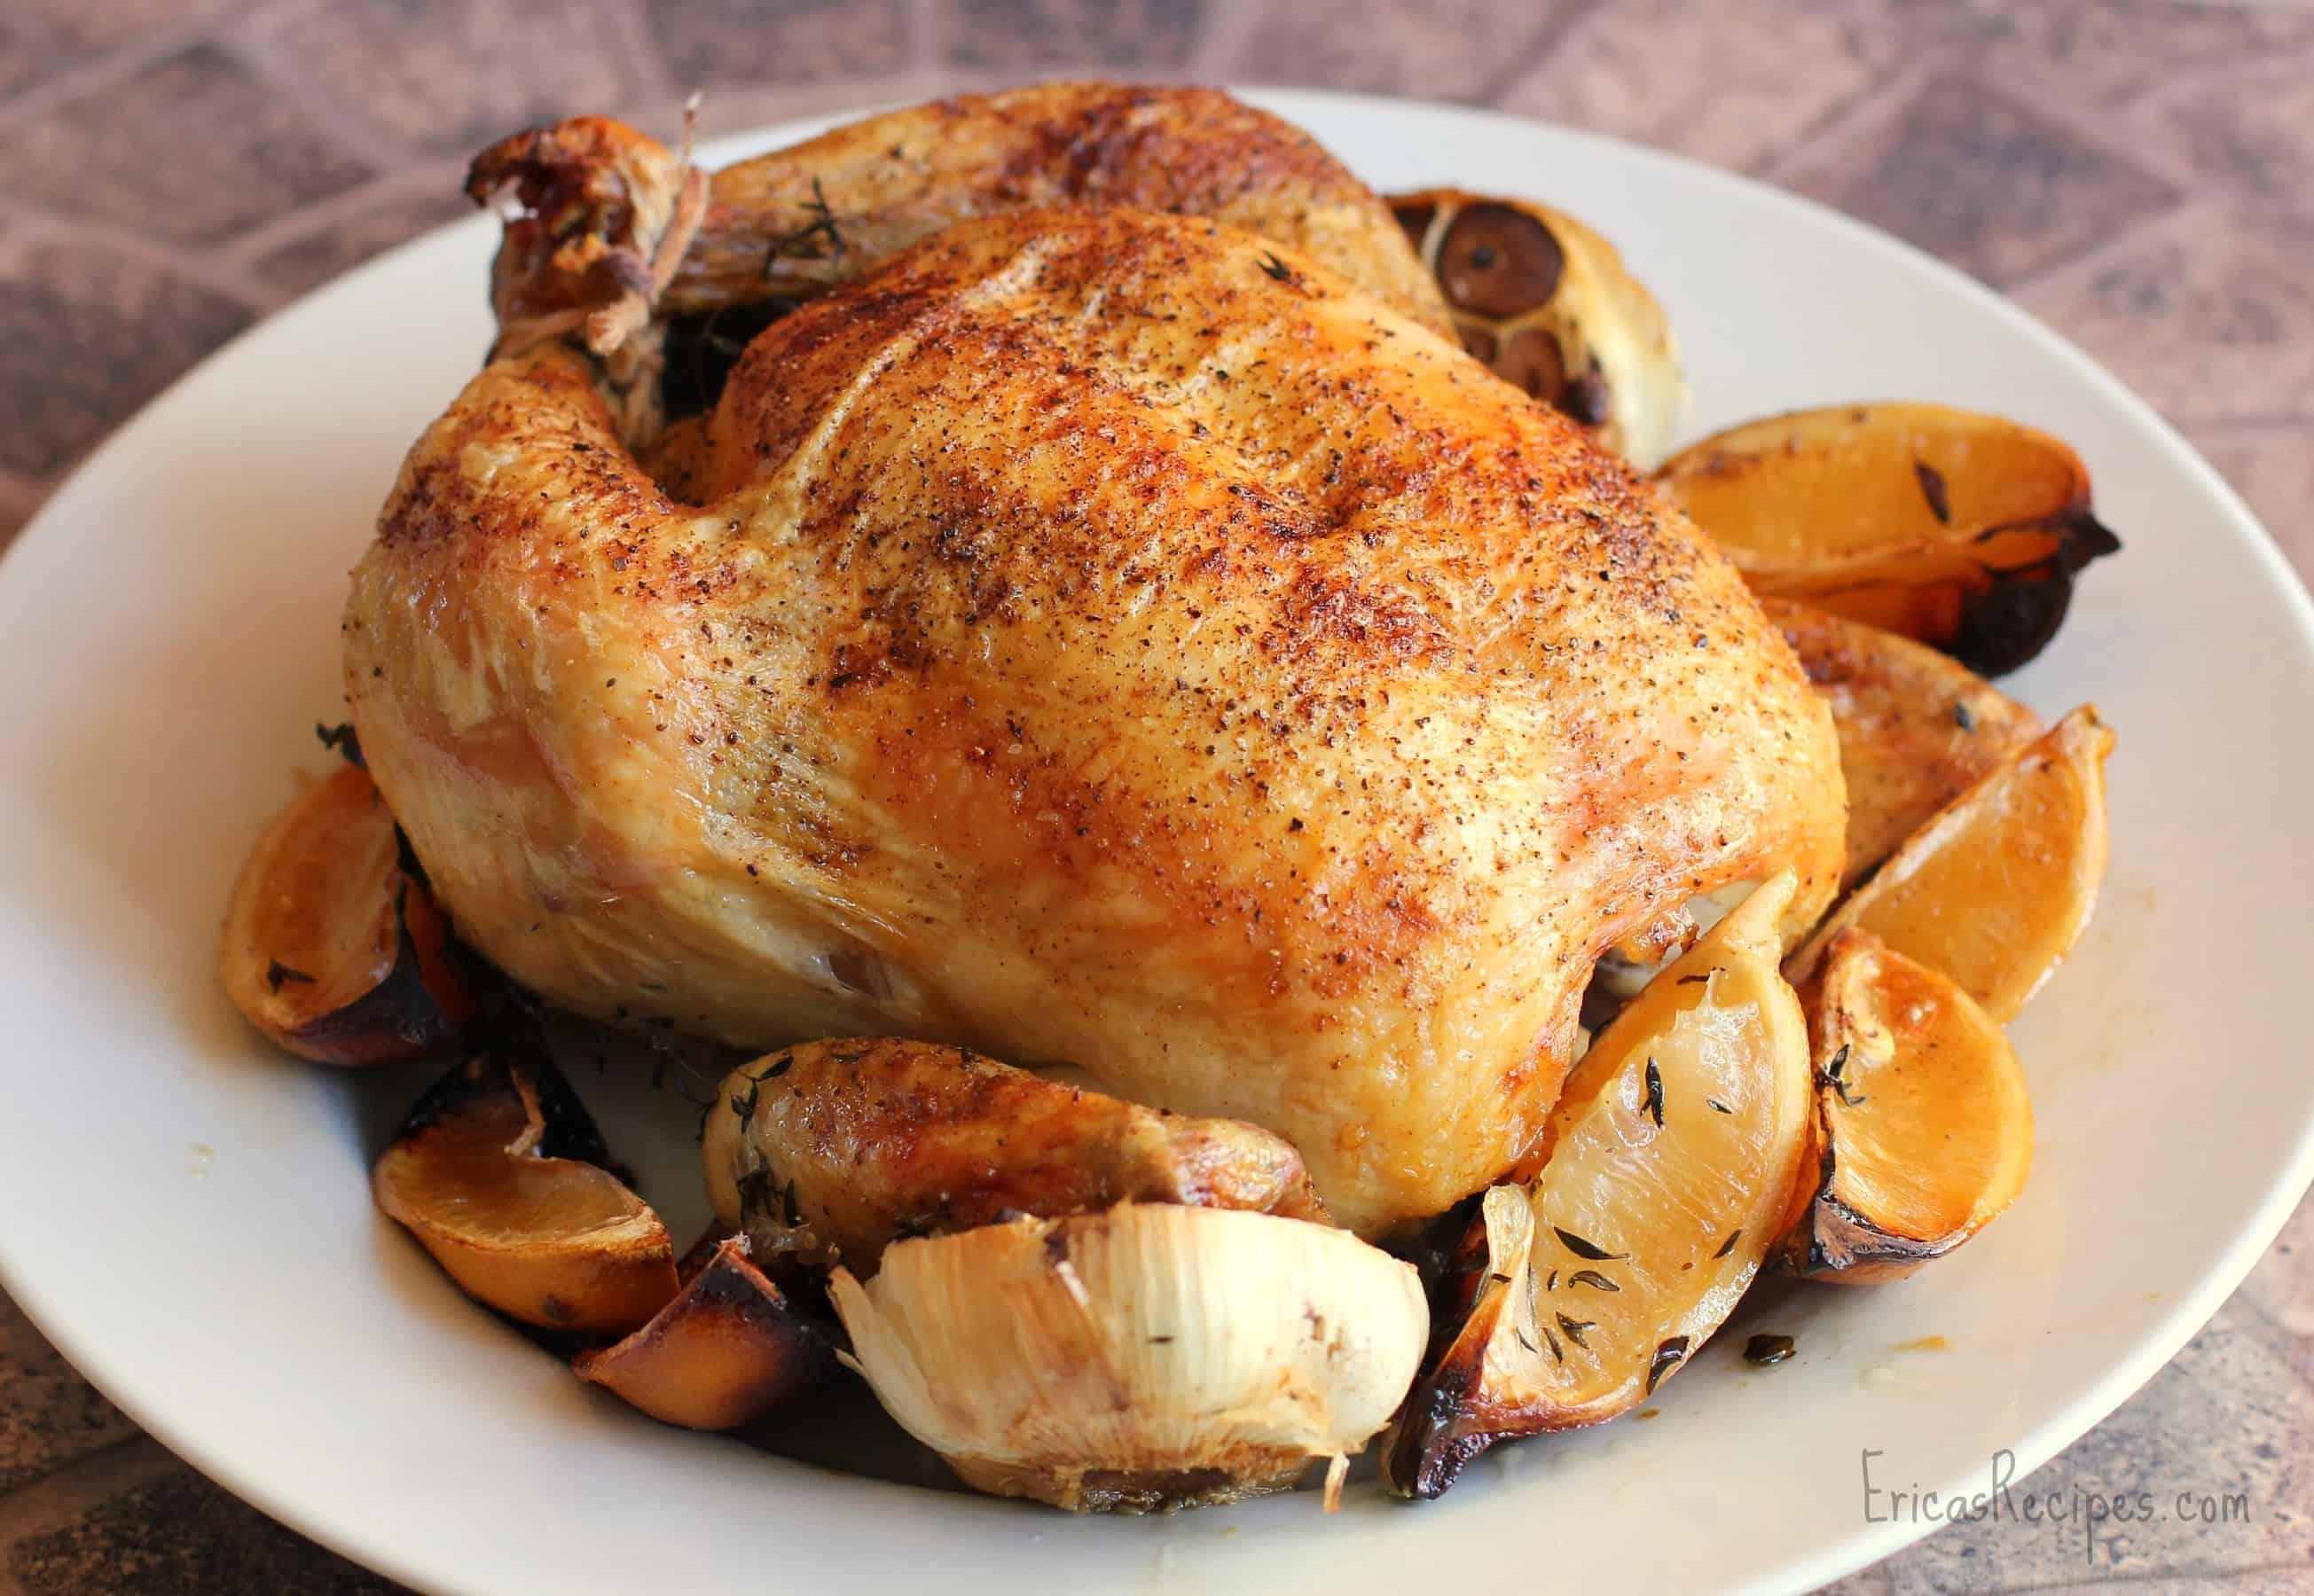 Roast Chicken with Lemon and Garlic